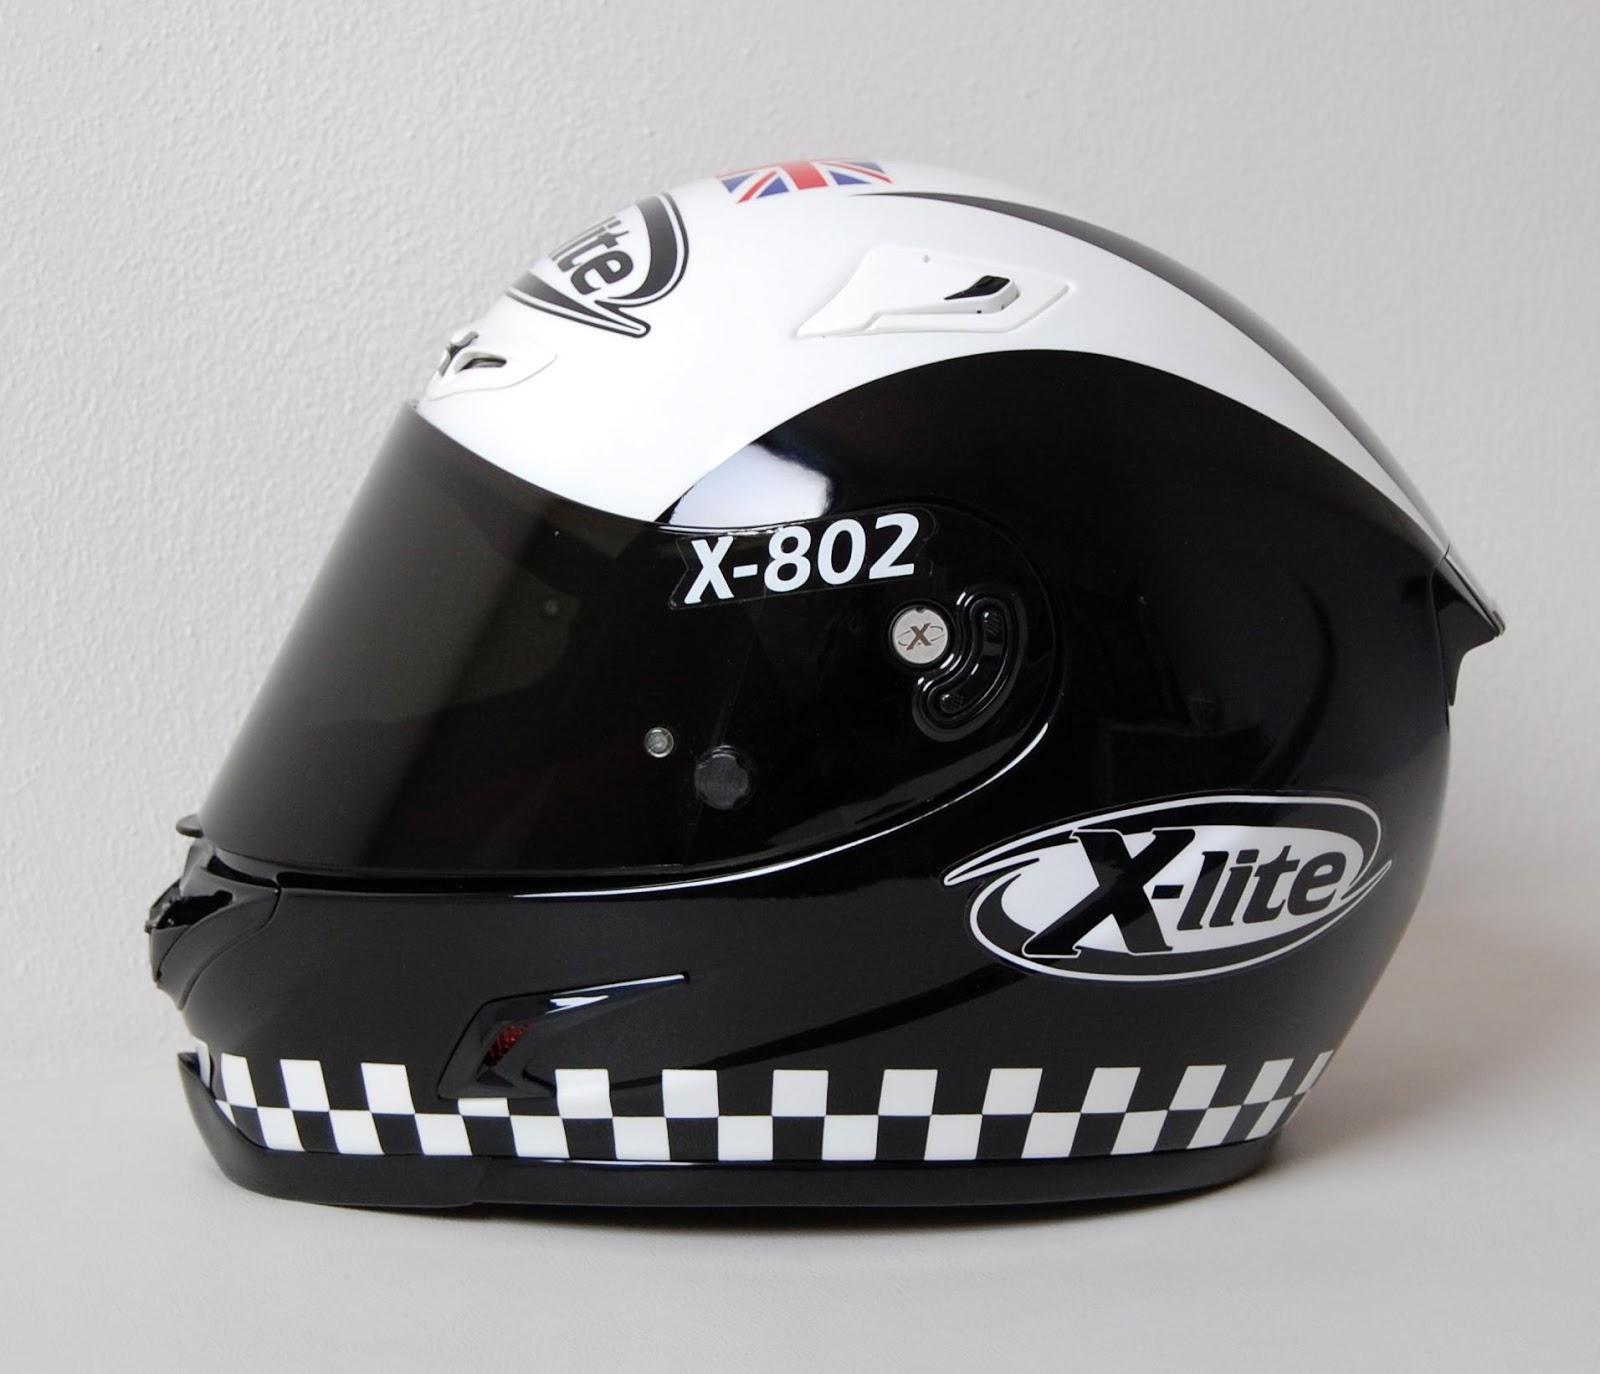 racing helmets garage x lite x 802r p read 200 miglia di. Black Bedroom Furniture Sets. Home Design Ideas